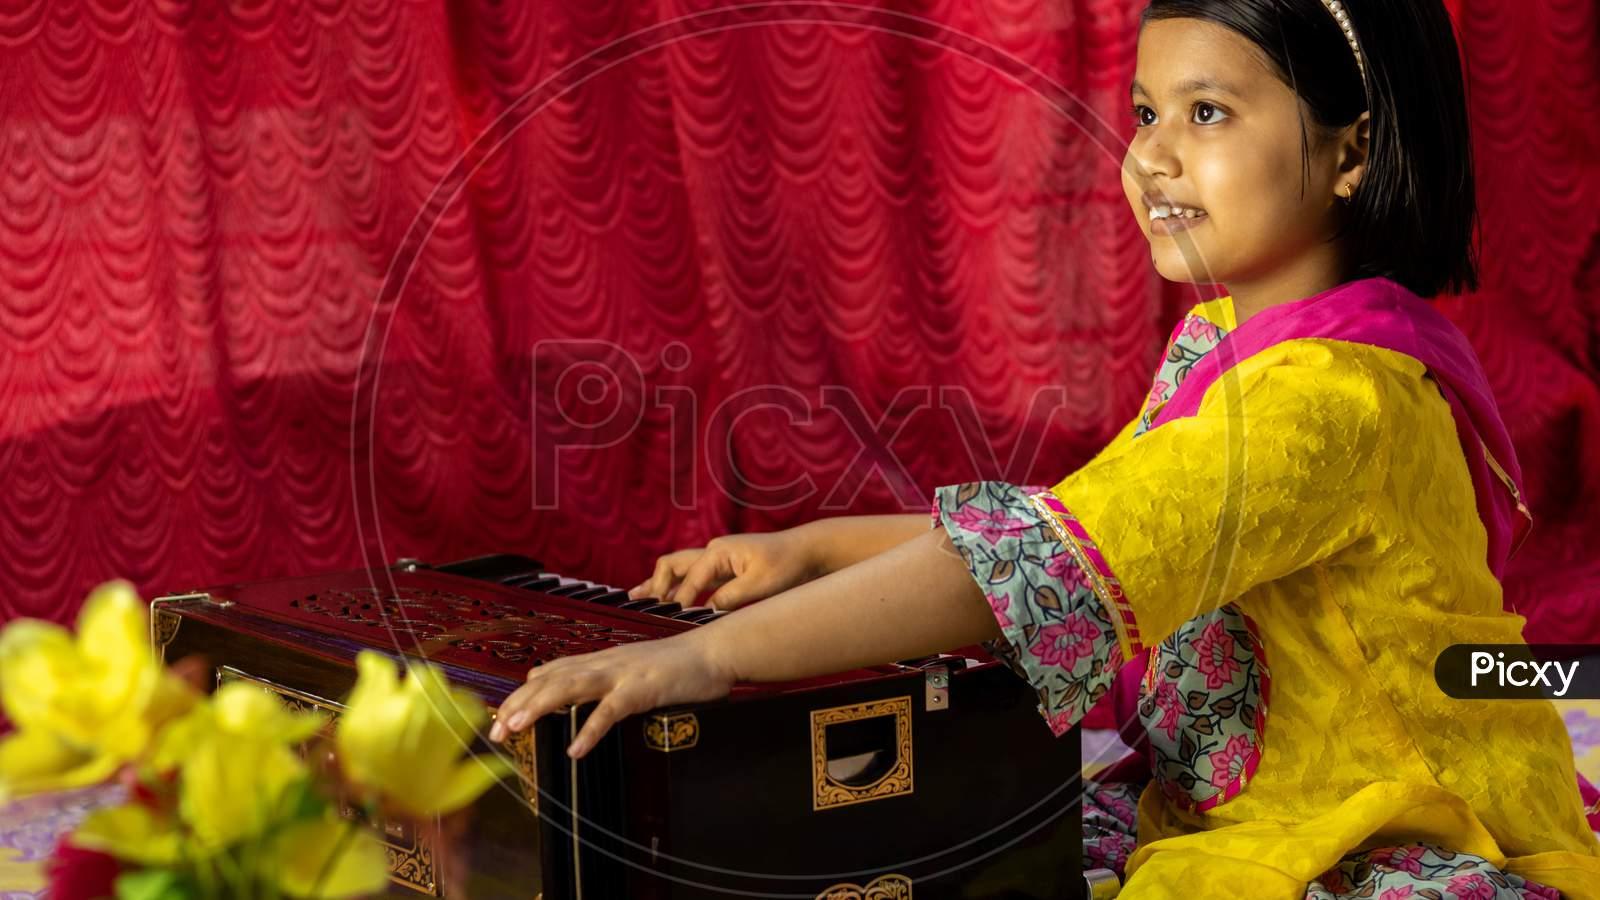 Harmonium - A Hand Made Wooden Musical Instrument